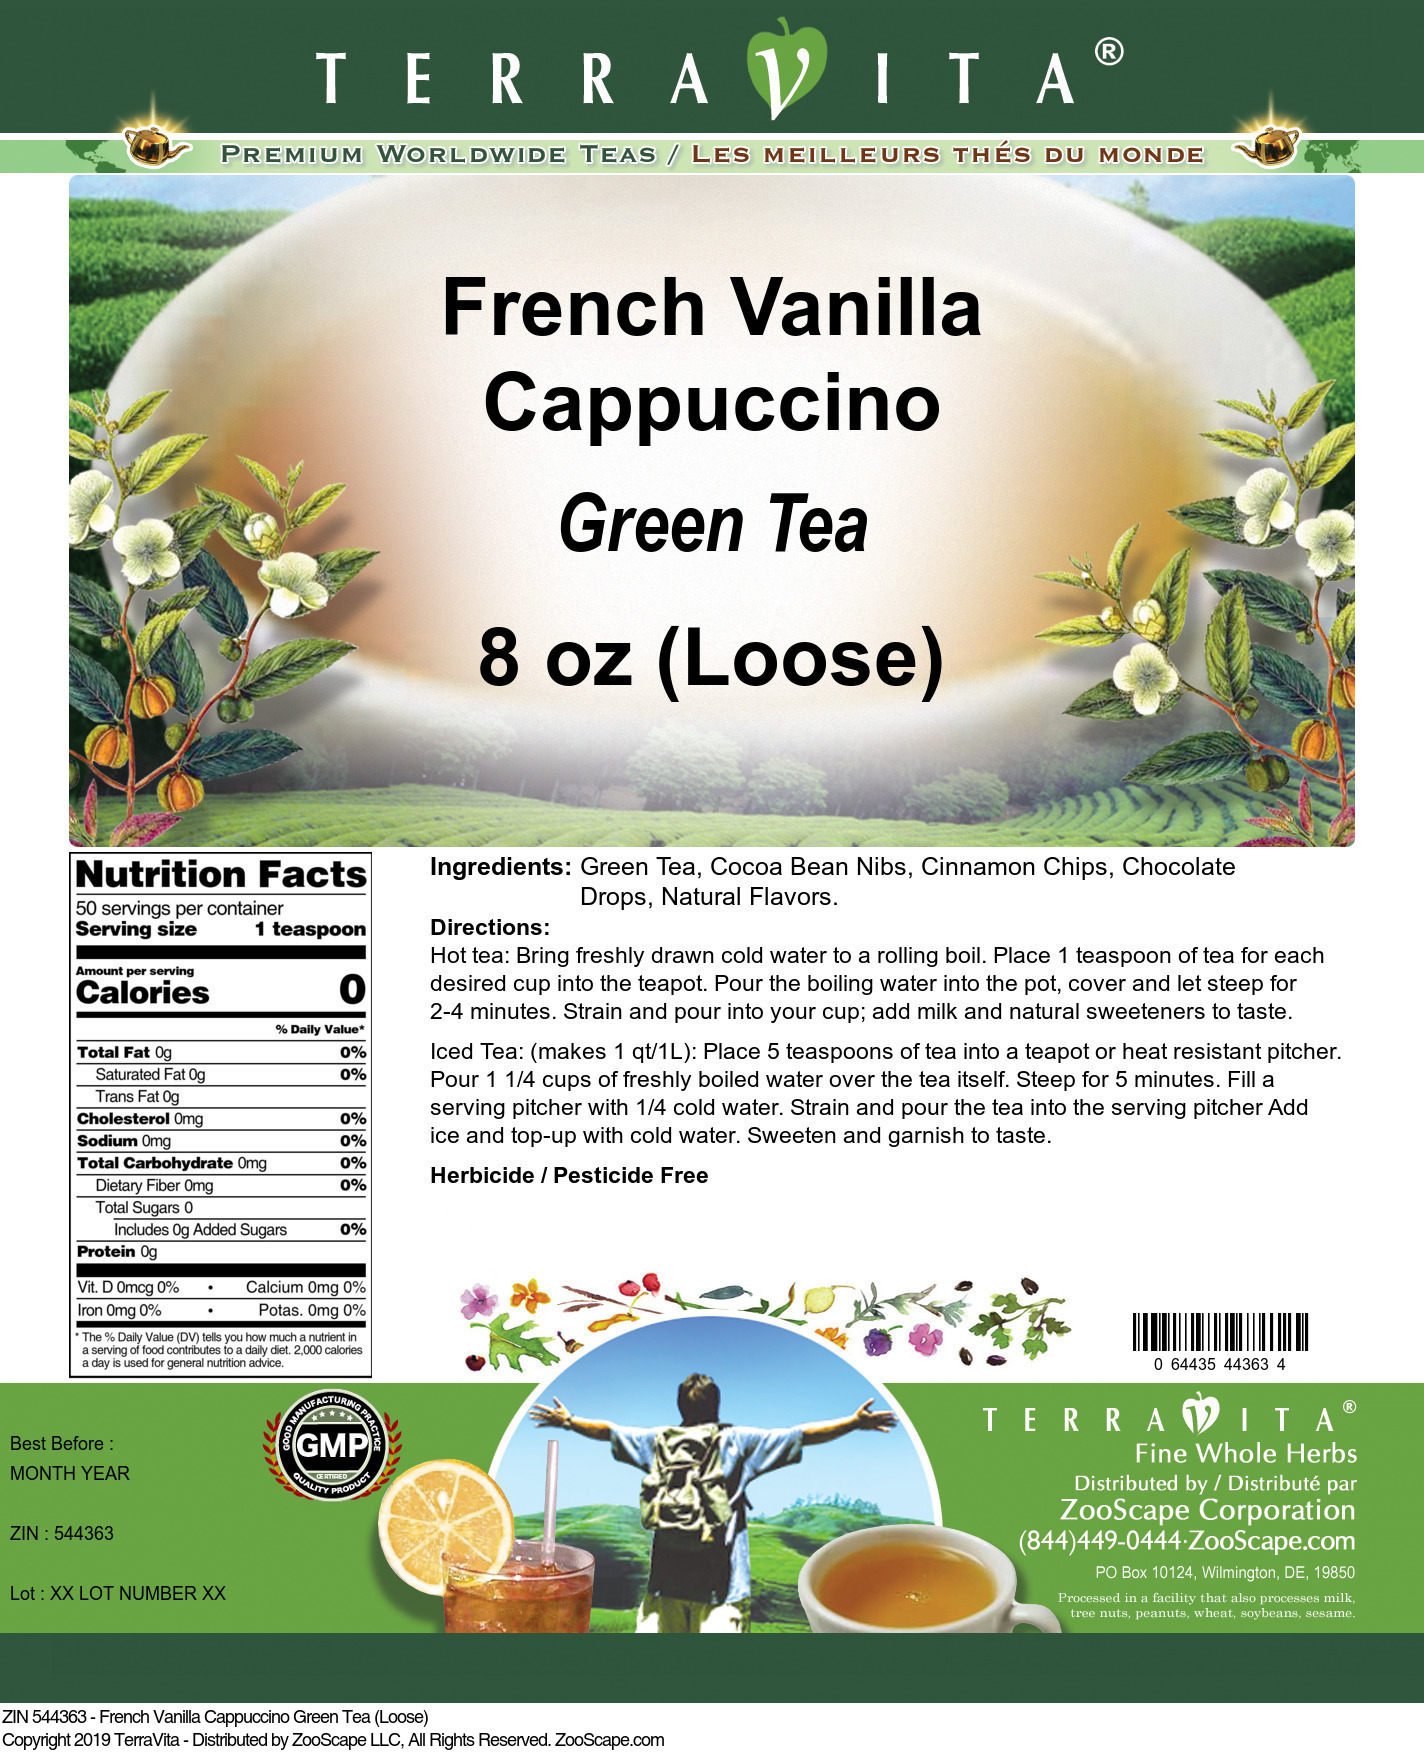 French Vanilla Cappuccino Green Tea (Loose)